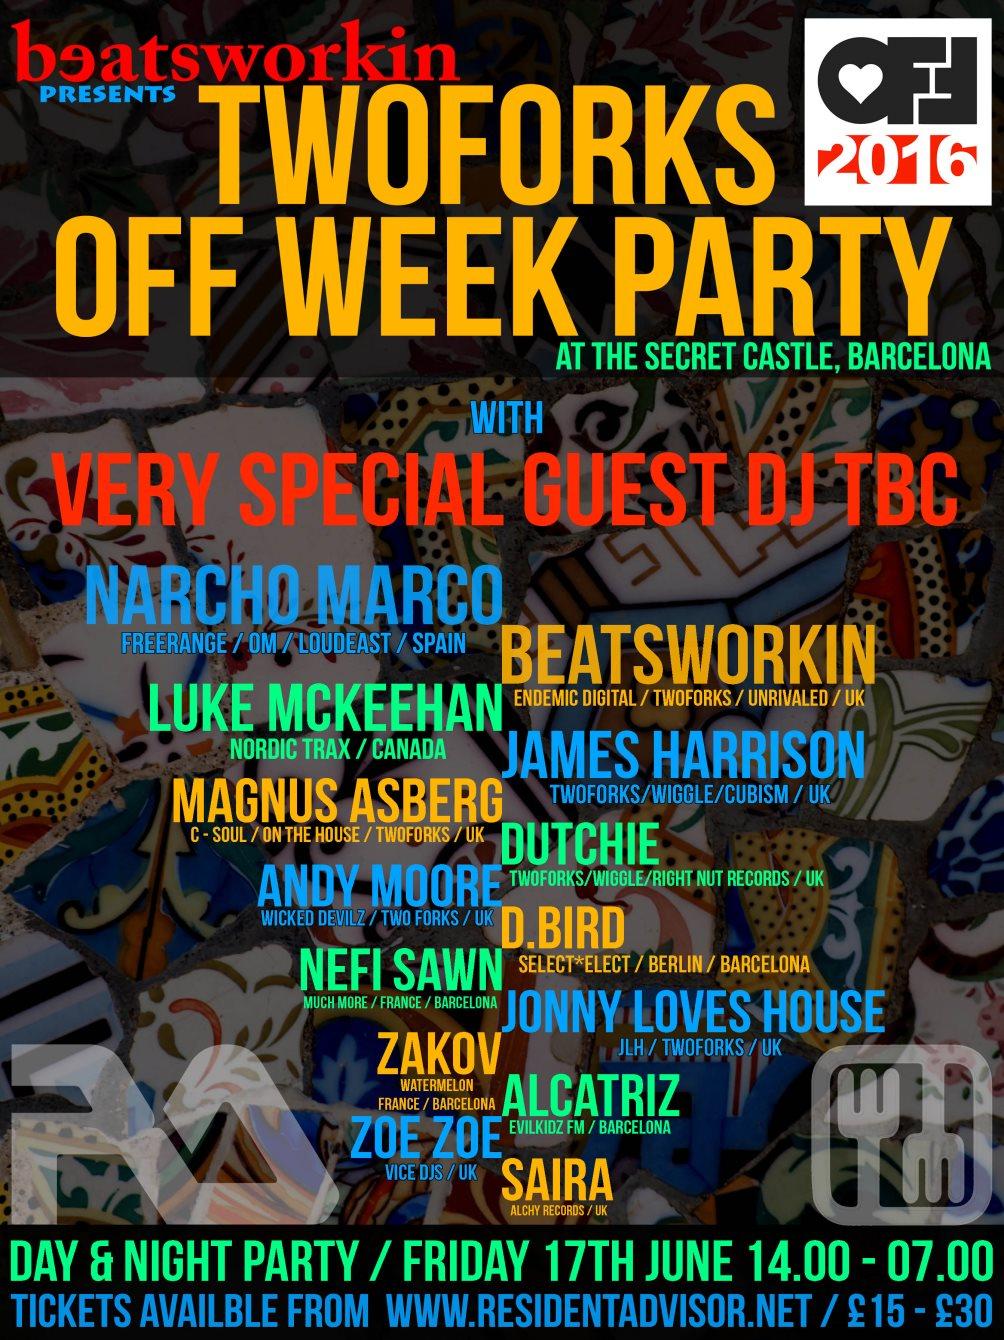 [CANCELLED] Beatsworkin presents: Twoforks Off Week Secret Castle Party with Vincenzo & Funk D'void - Flyer back